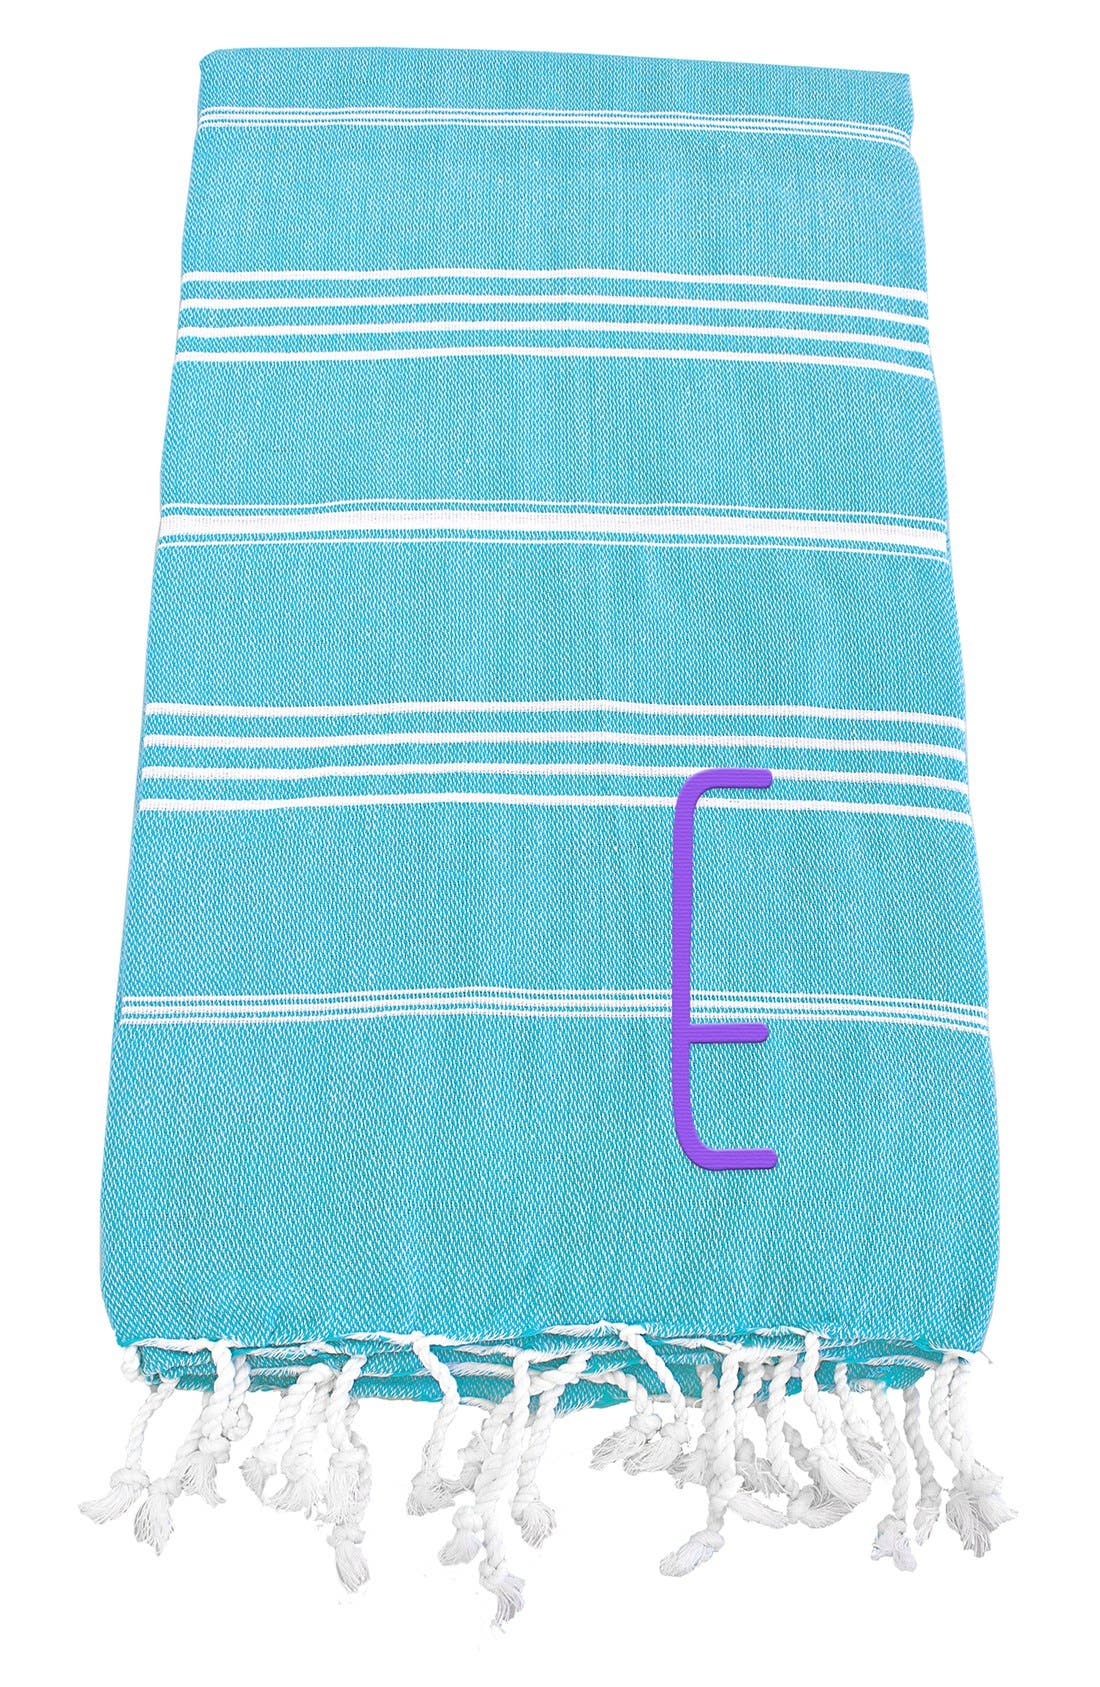 Monogram Turkish Cotton Towel,                             Main thumbnail 88, color,